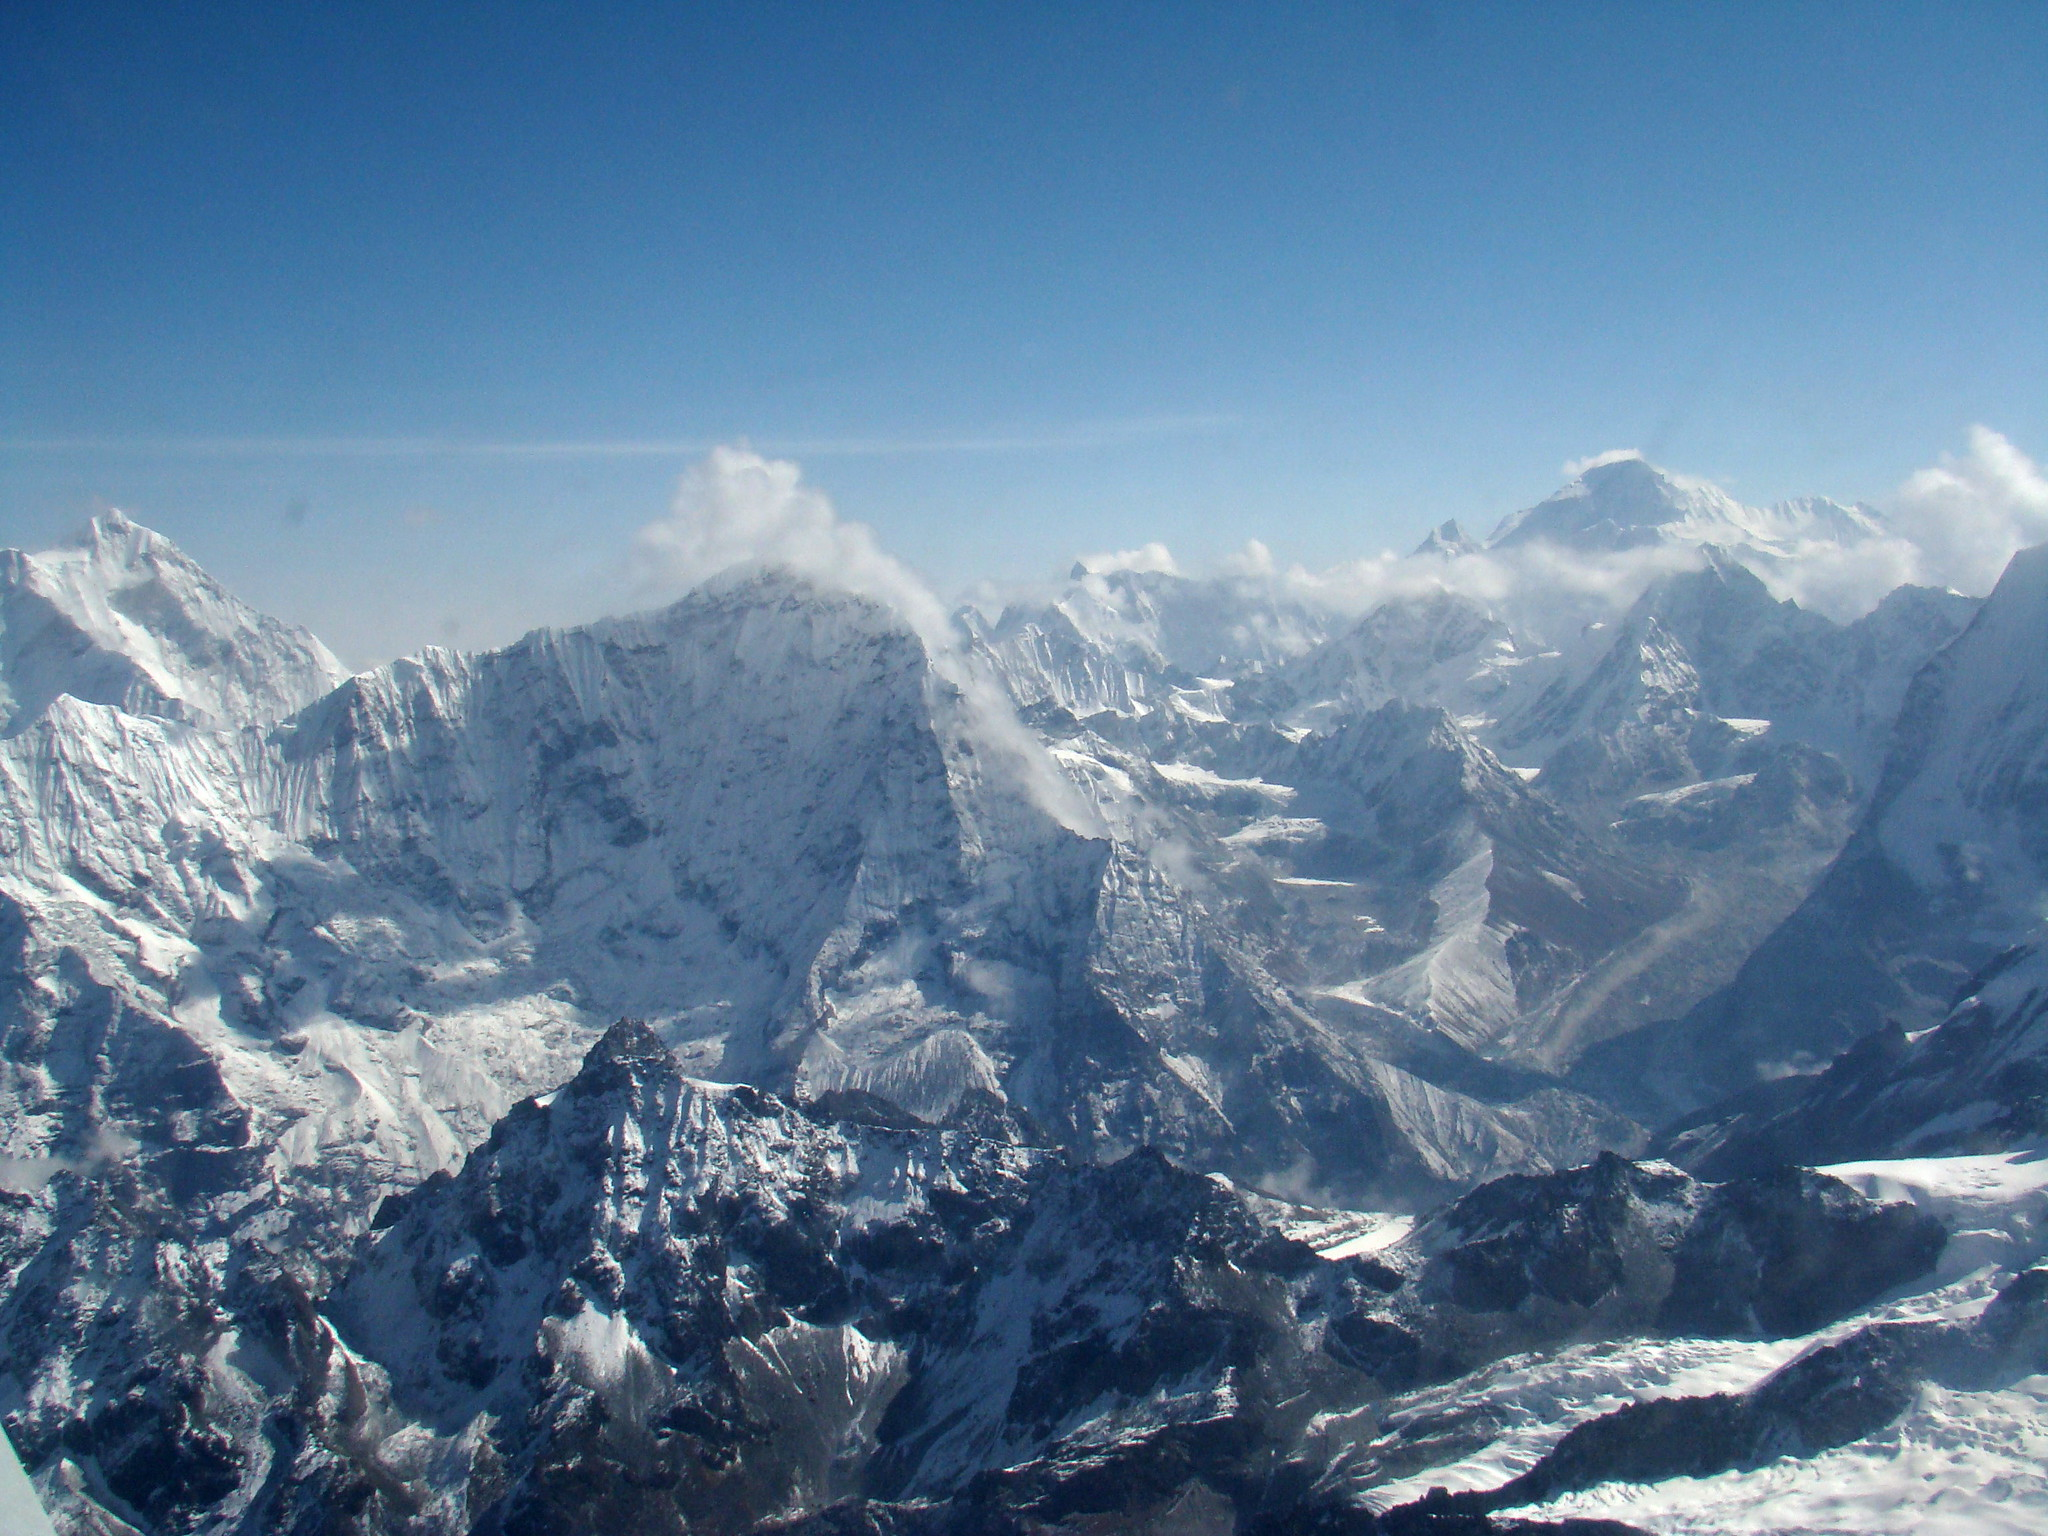 Vuelo al Everest Himalaya Nepal Butan